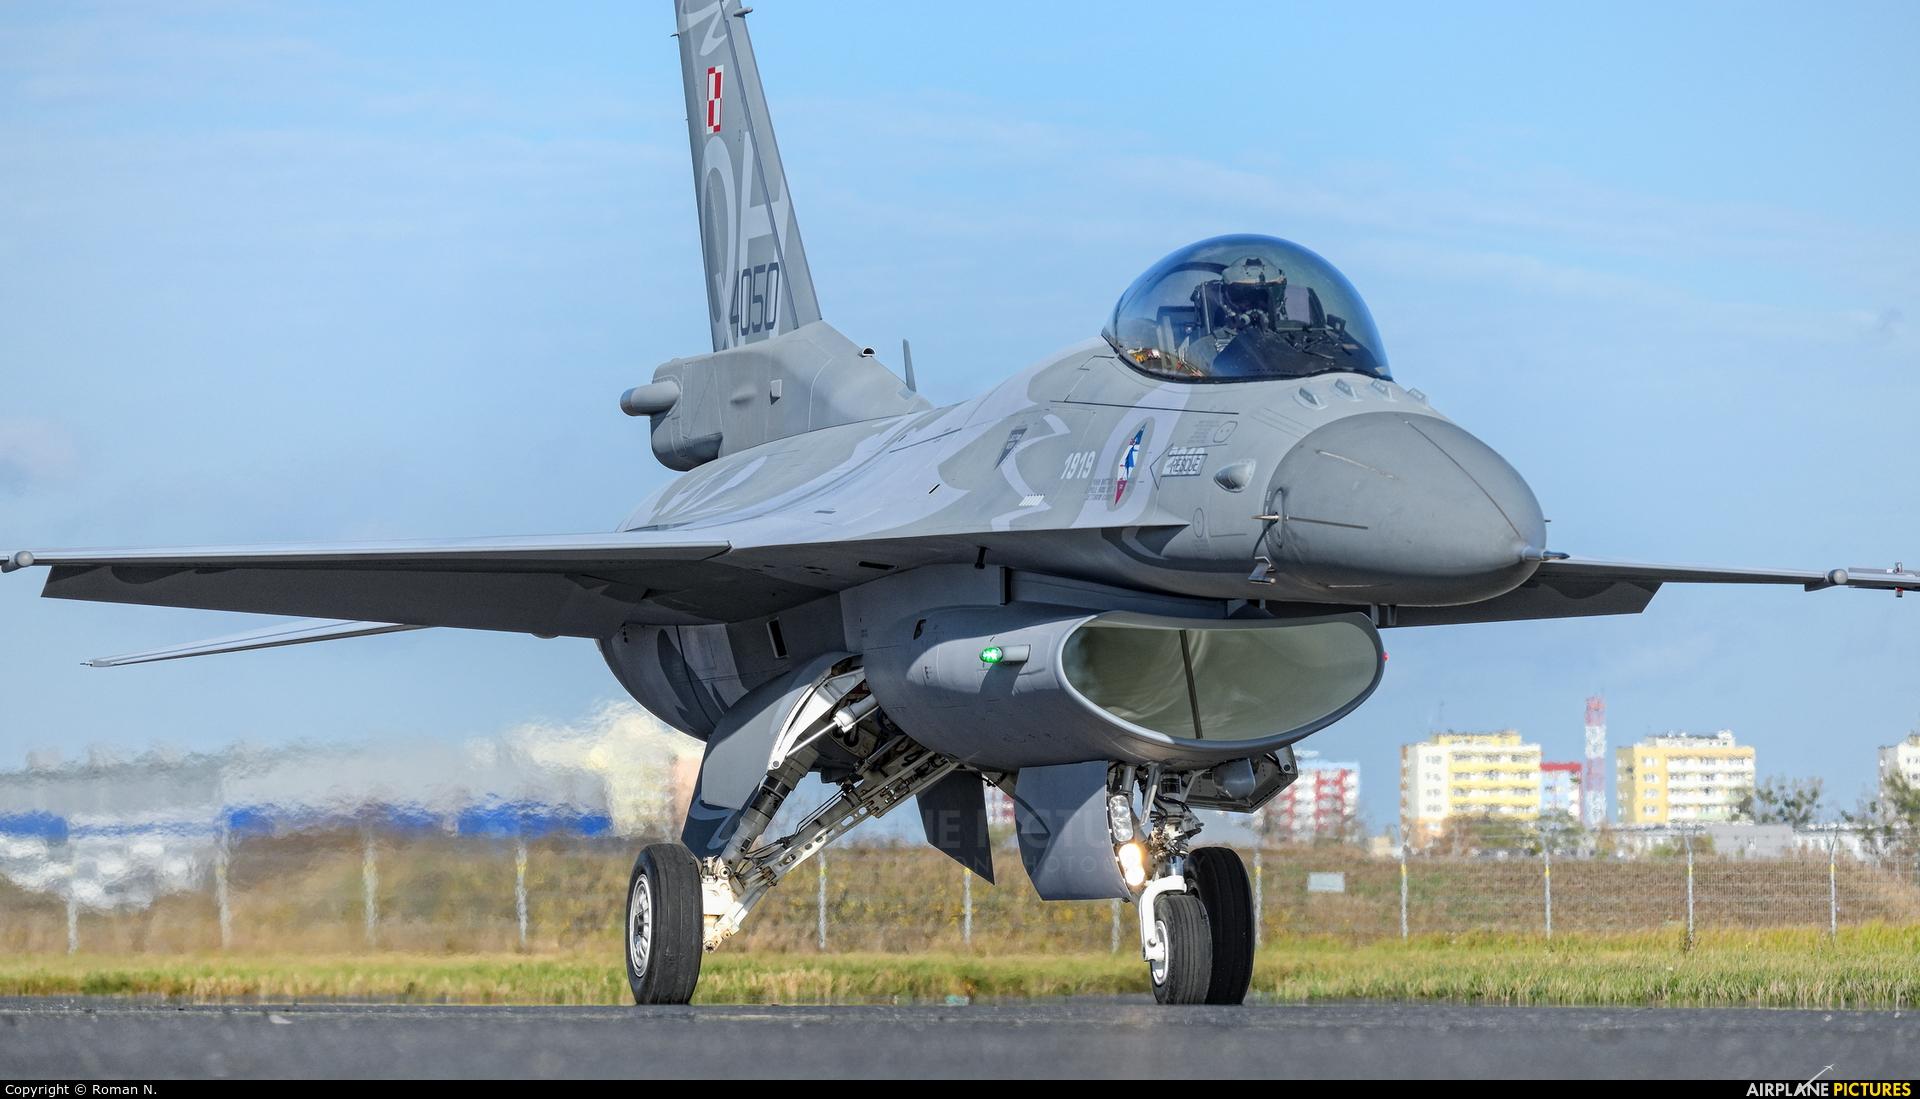 Poland - Air Force 4050 aircraft at Bydgoszcz - Szwederowo